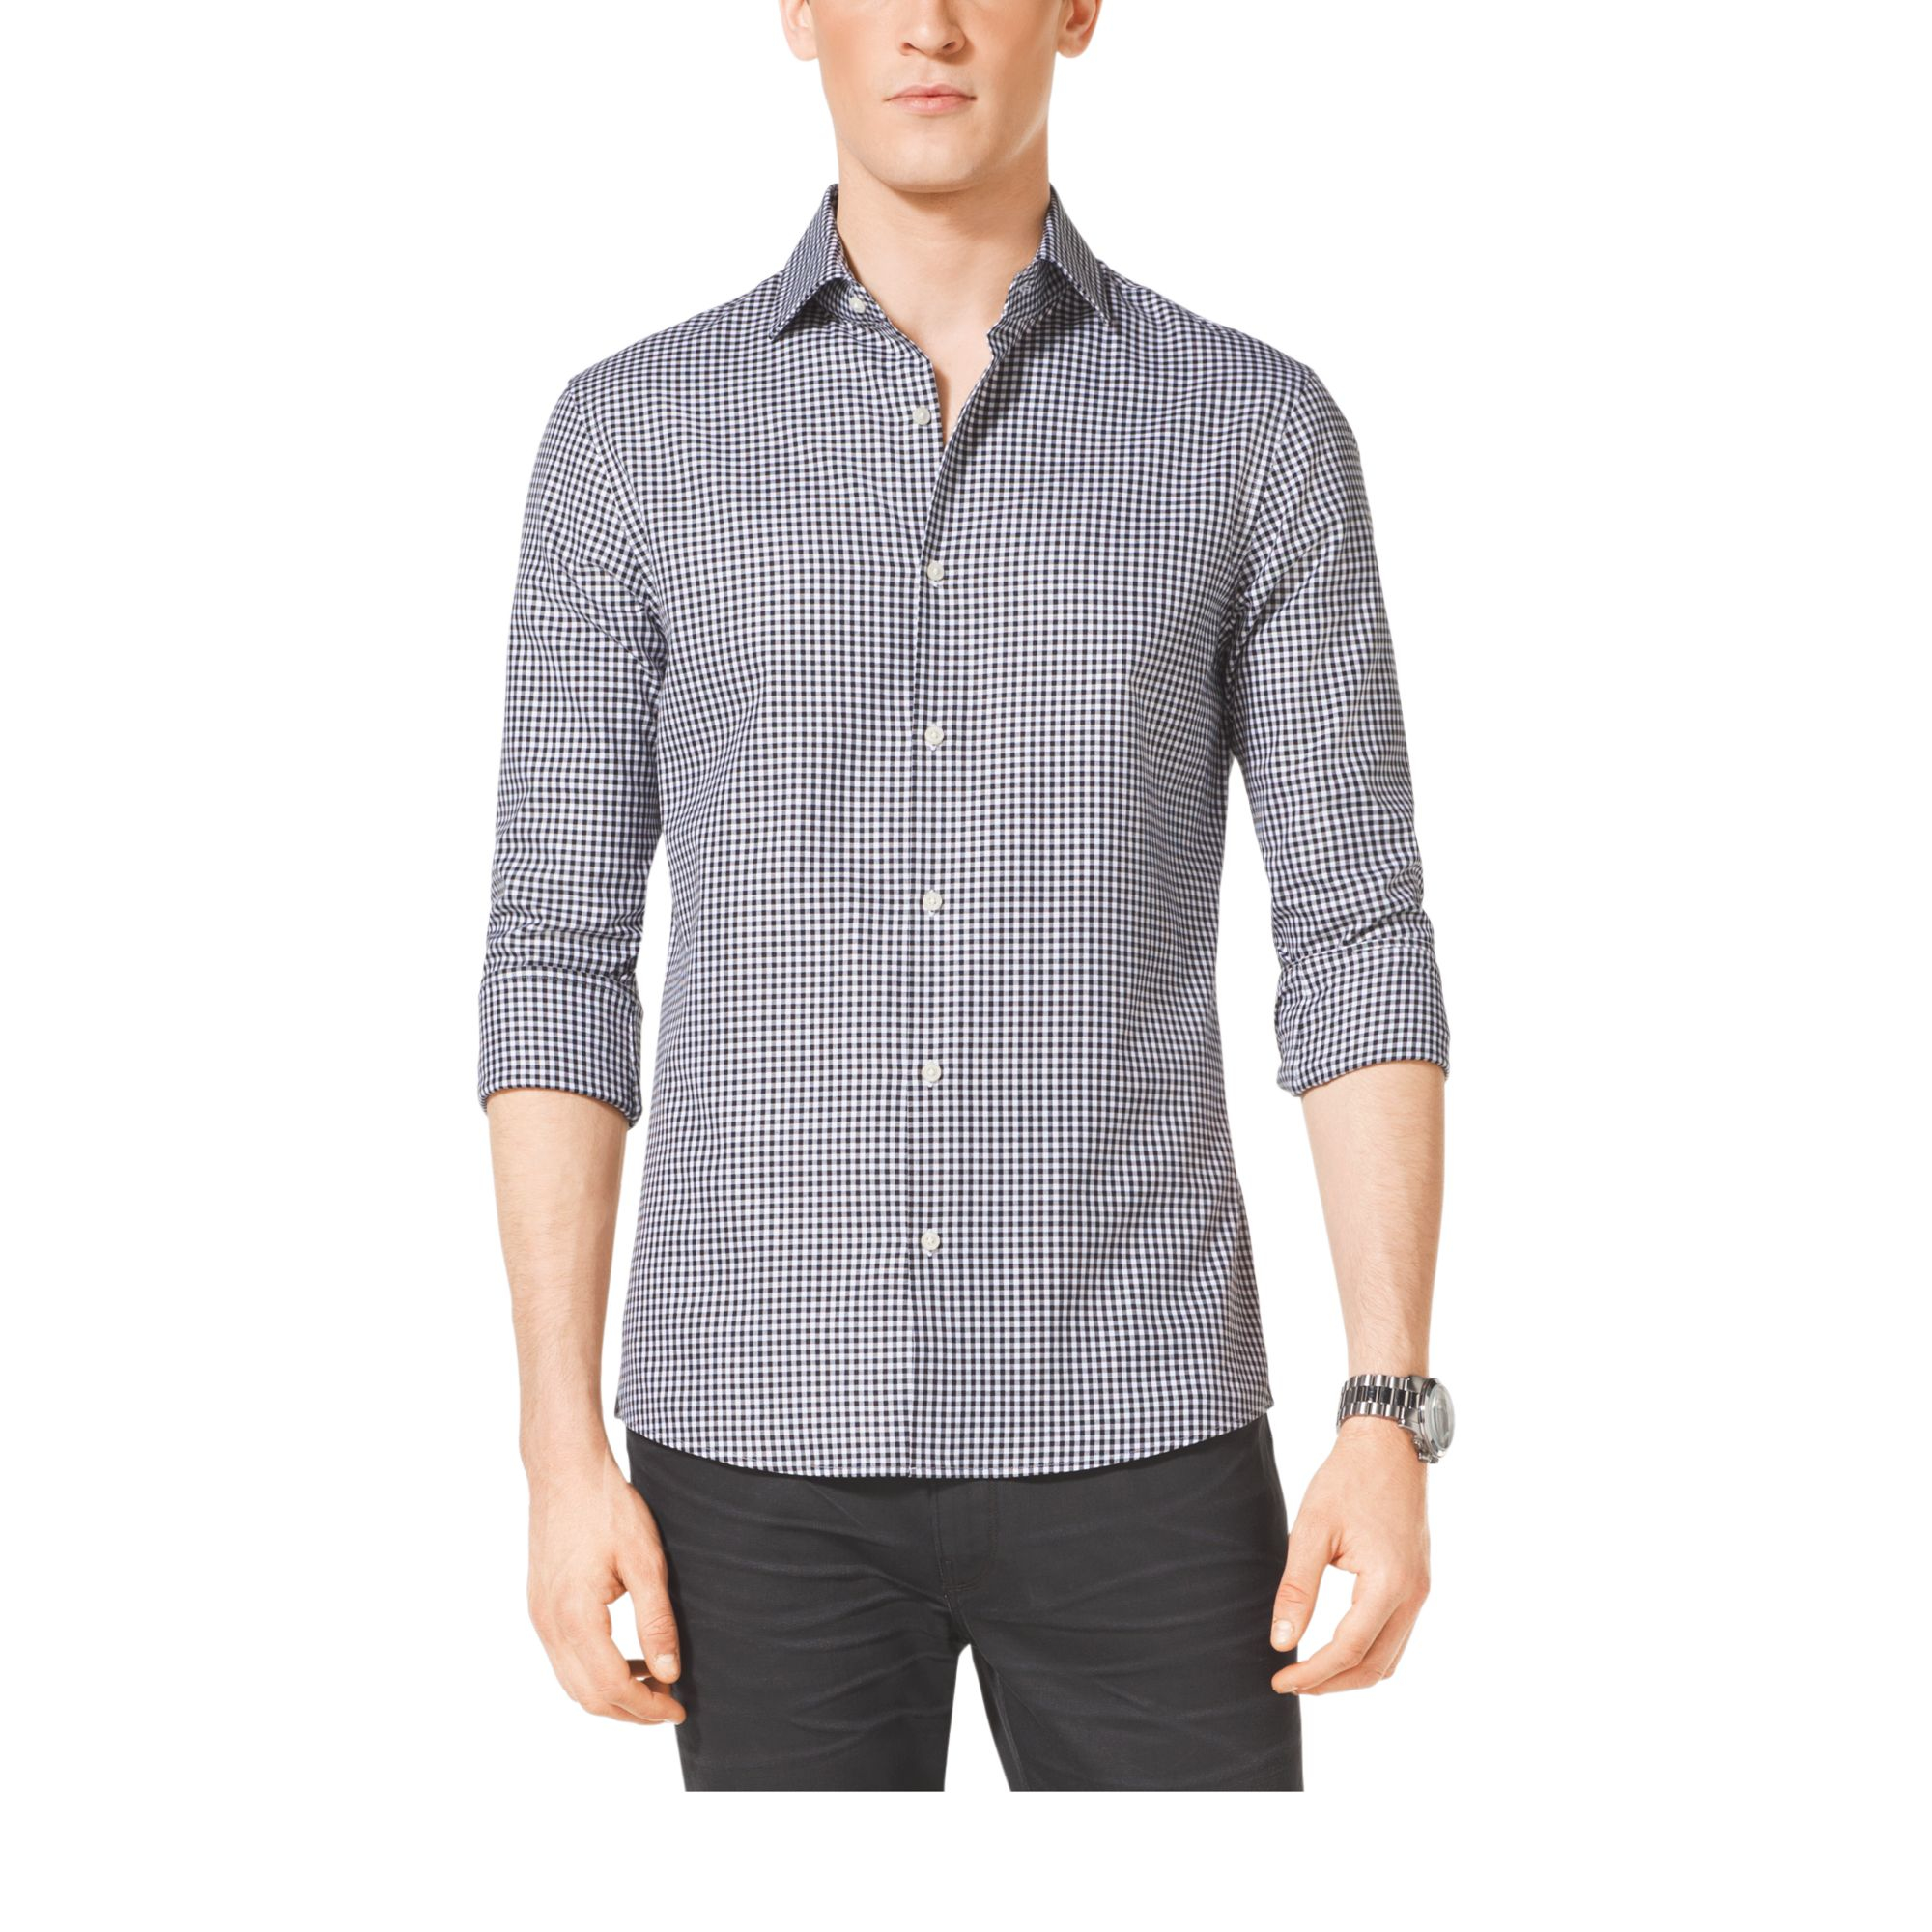 Michael Kors Slim Fit Check Cotton Shirt In Gray For Men